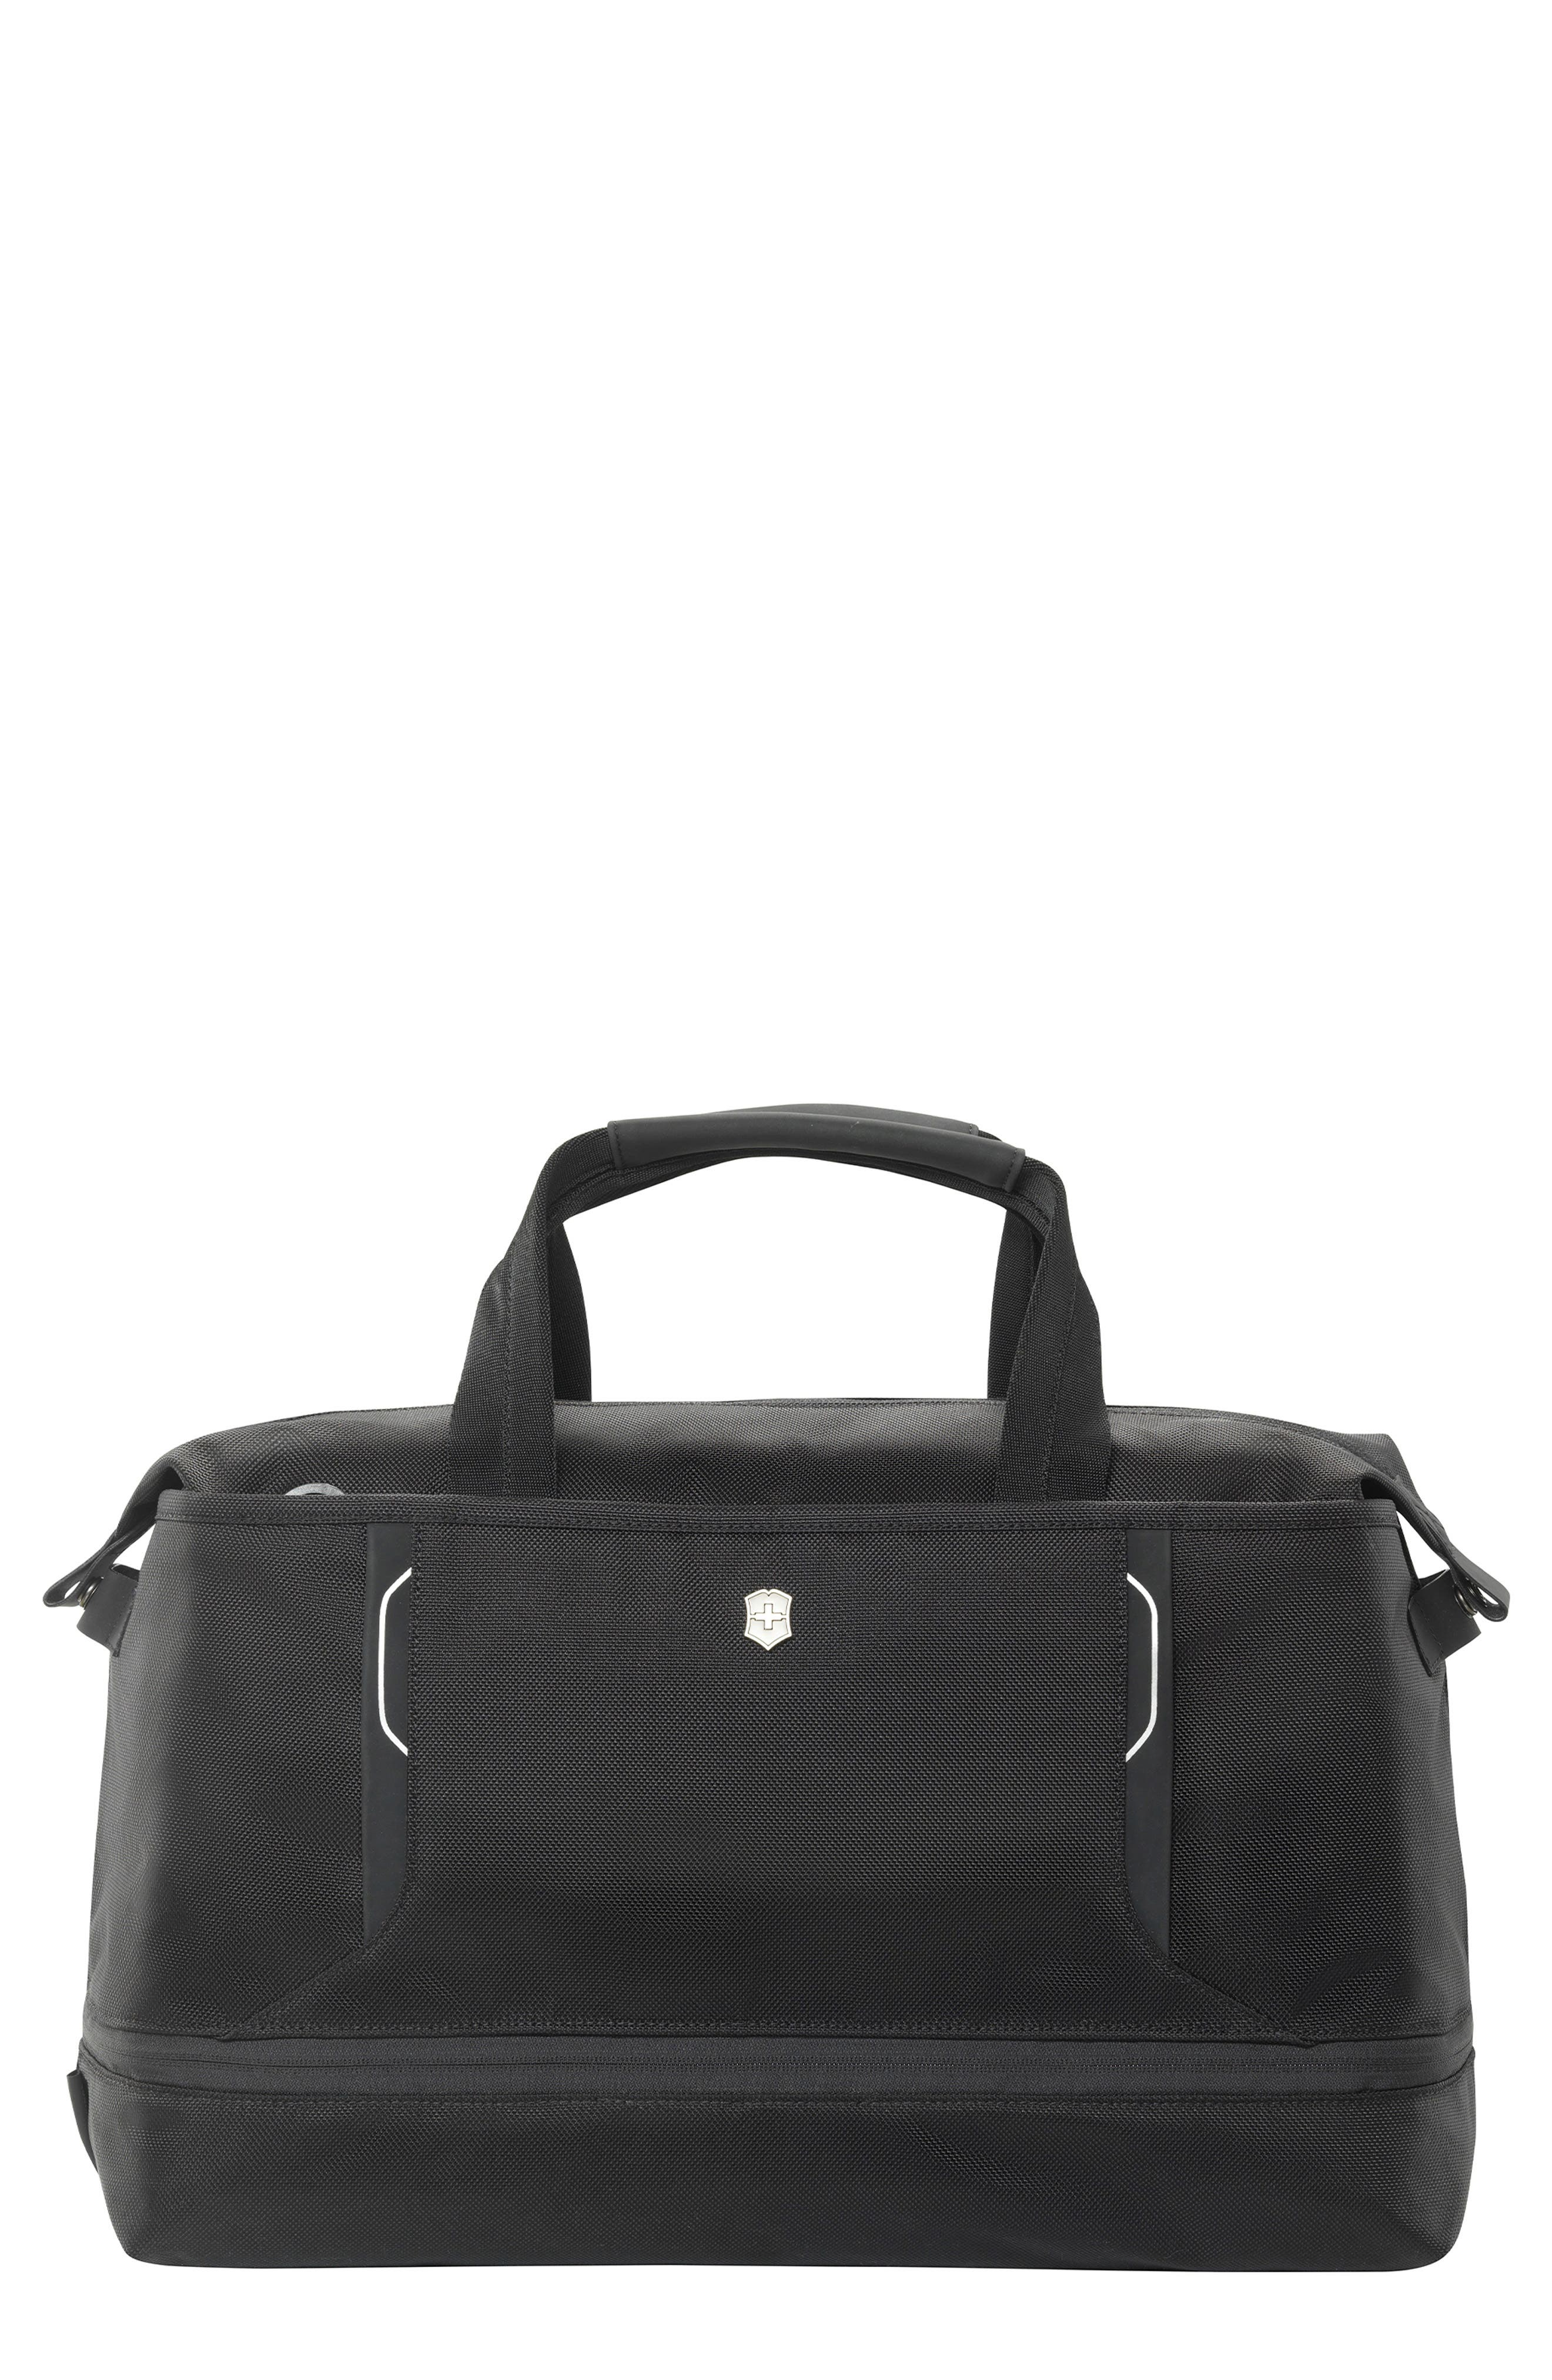 Men's Victorinox Swiss Army Werks 6.0 Duffle Bag